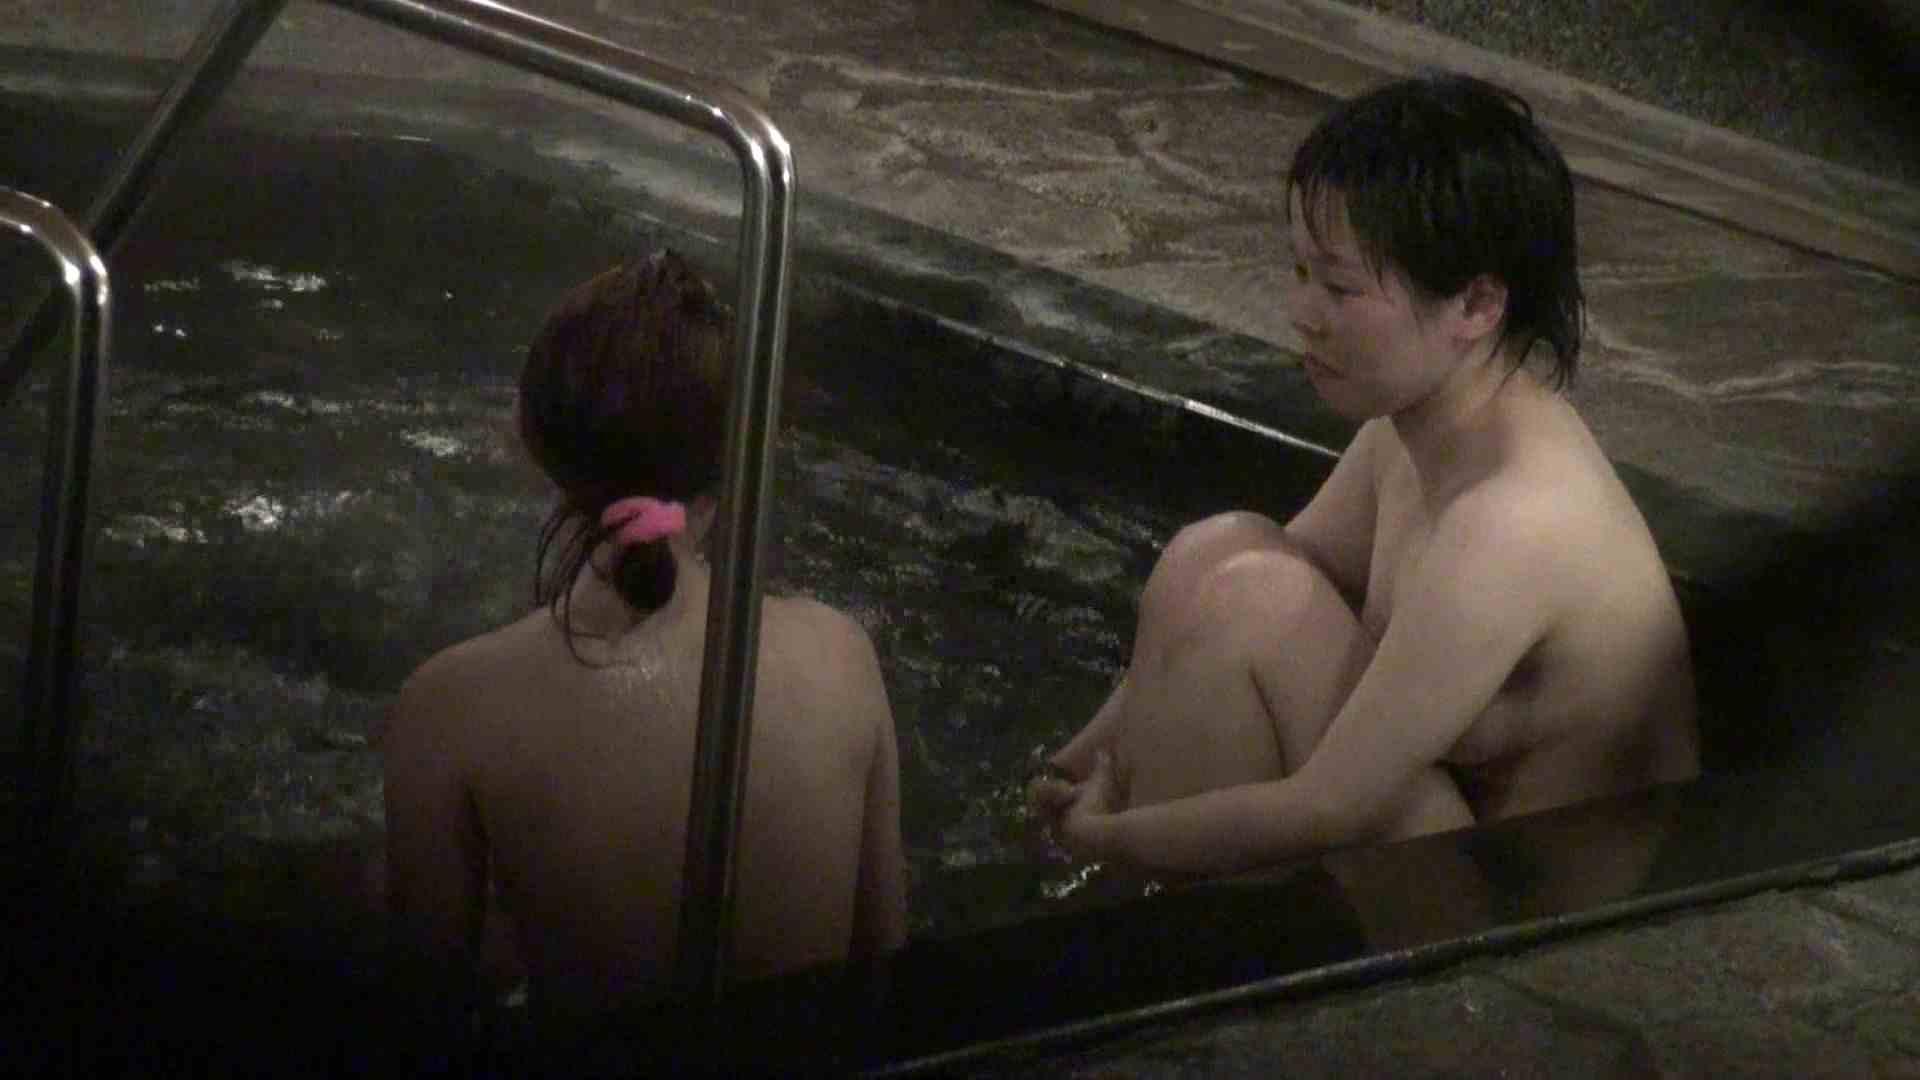 Aquaな露天風呂Vol.394 盗撮 | OLセックス  99画像 16